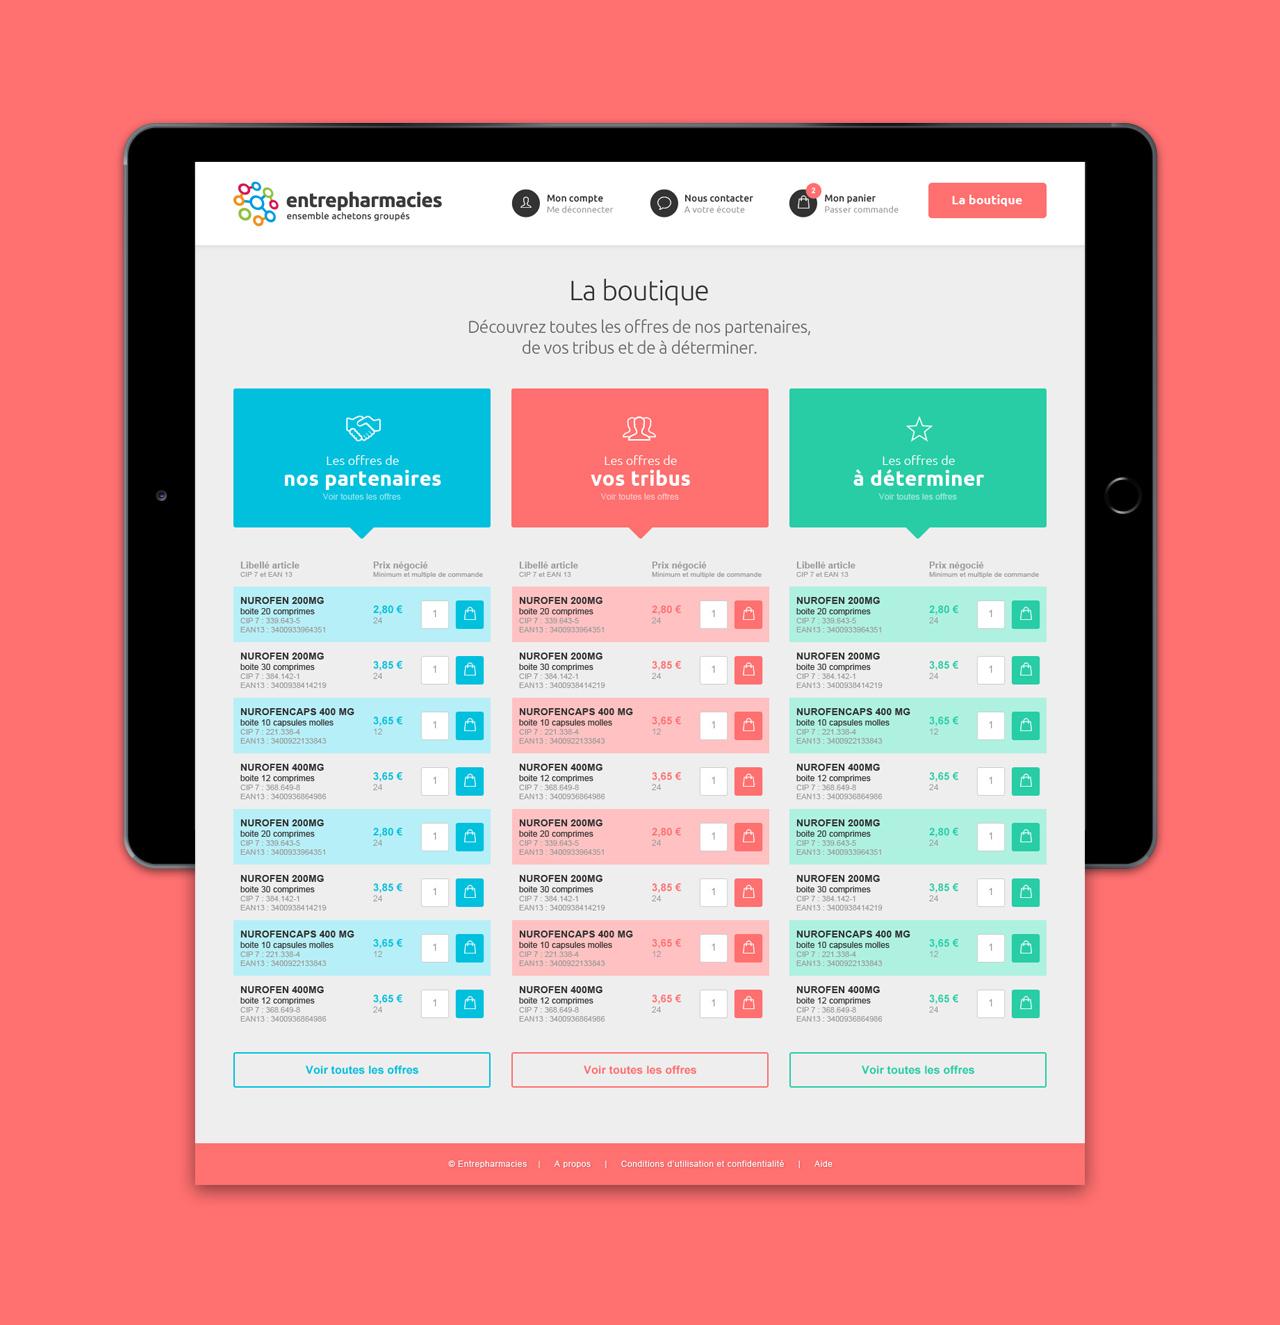 entrepharmacies-creation-site-web-3-caconcept-alexis-cretin-graphiste-montpellier